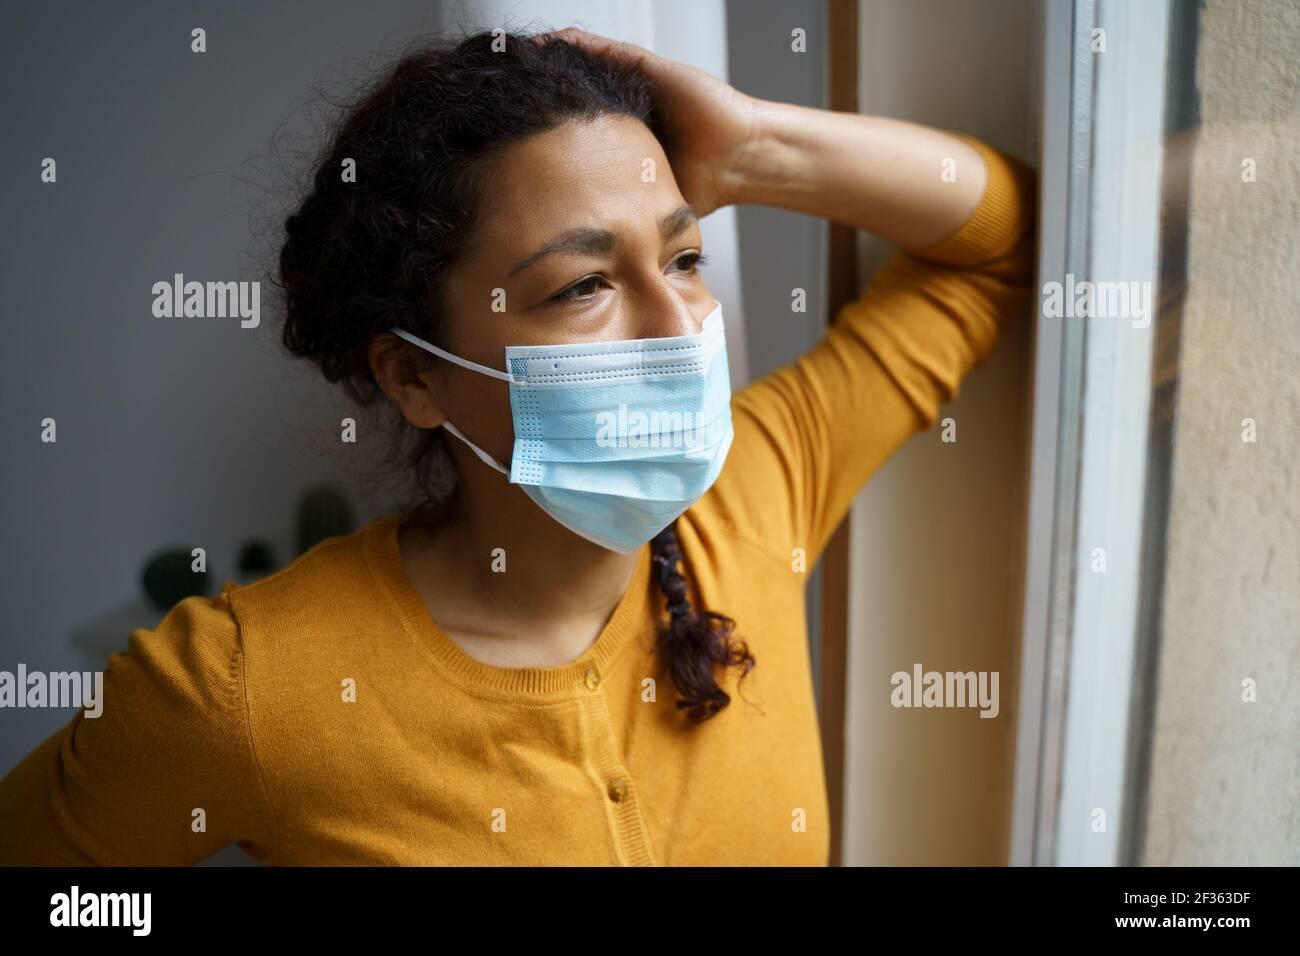 Mujer negra preocupada mirando por la ventana Foto de stock